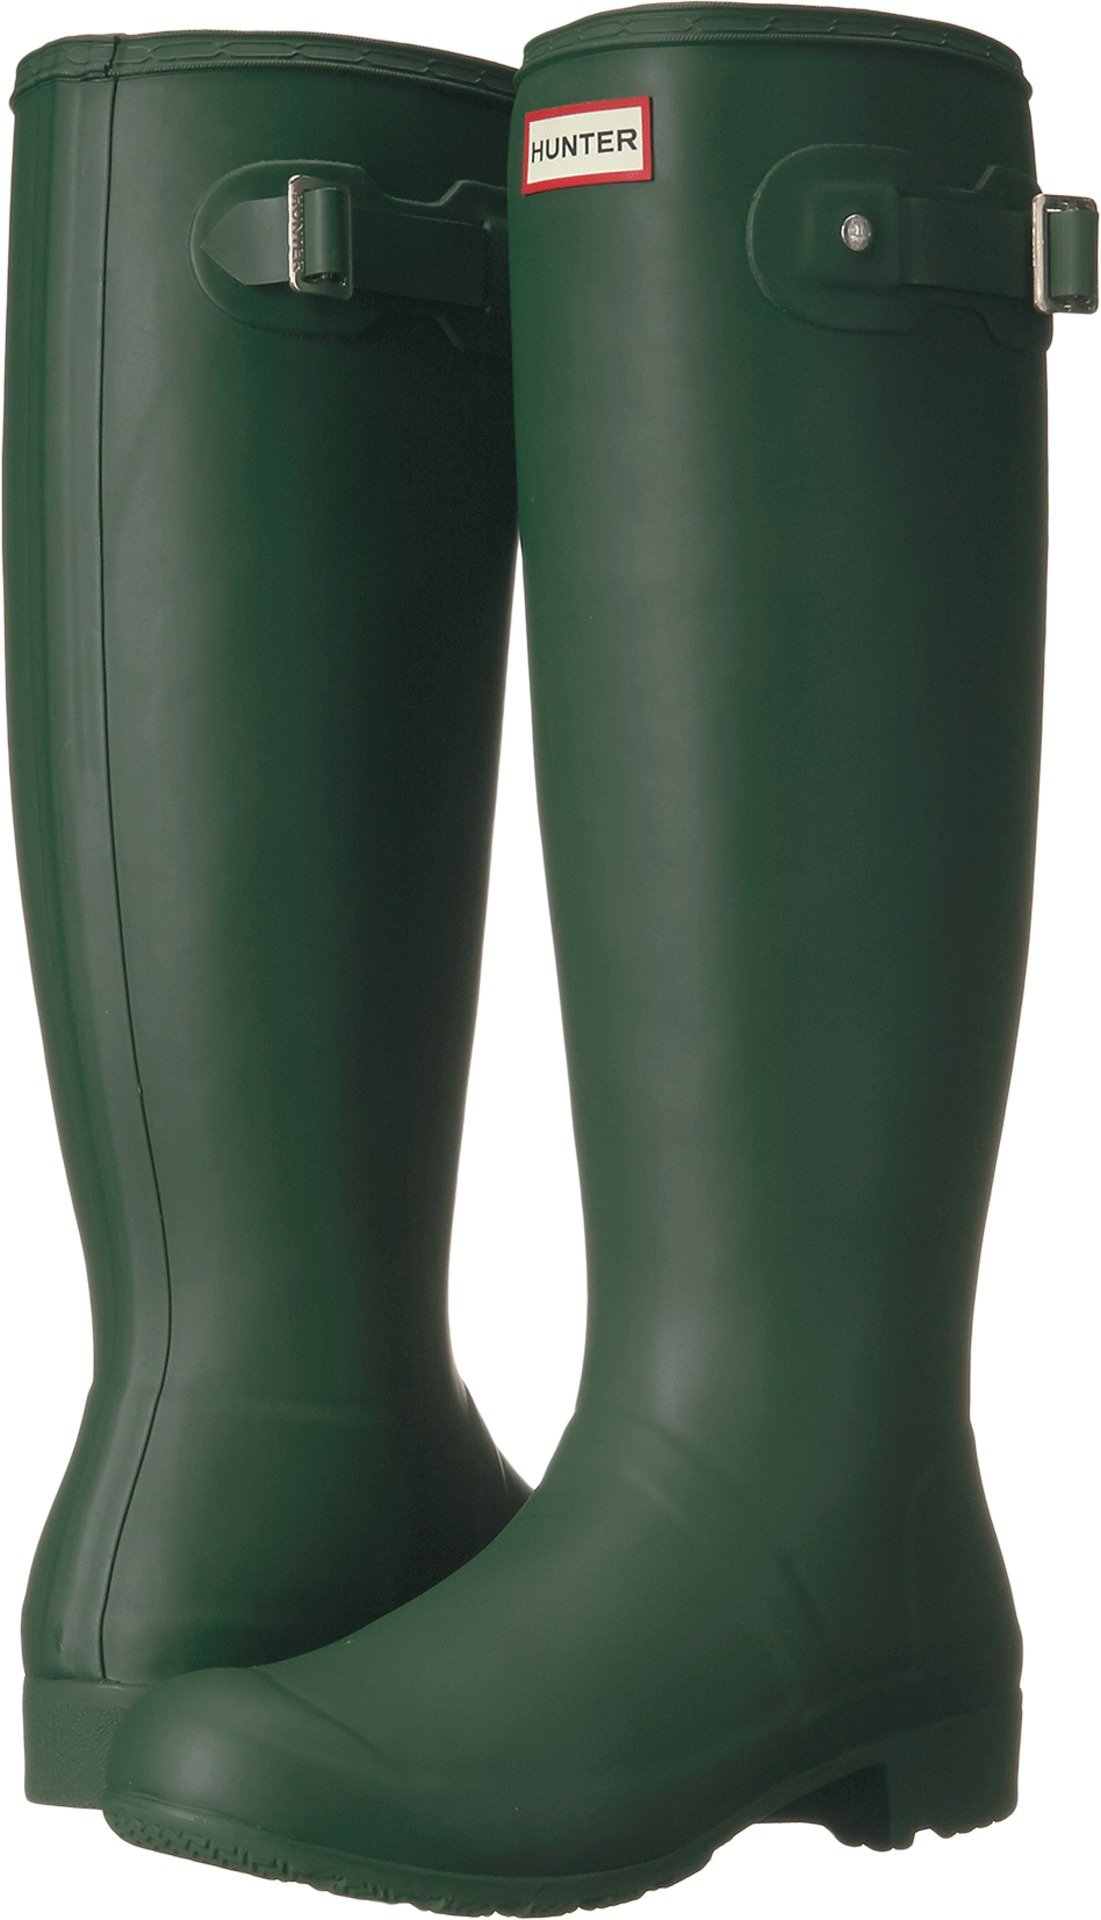 Hunter Original Tour Hunter Green Women's Rain Boots 9 M